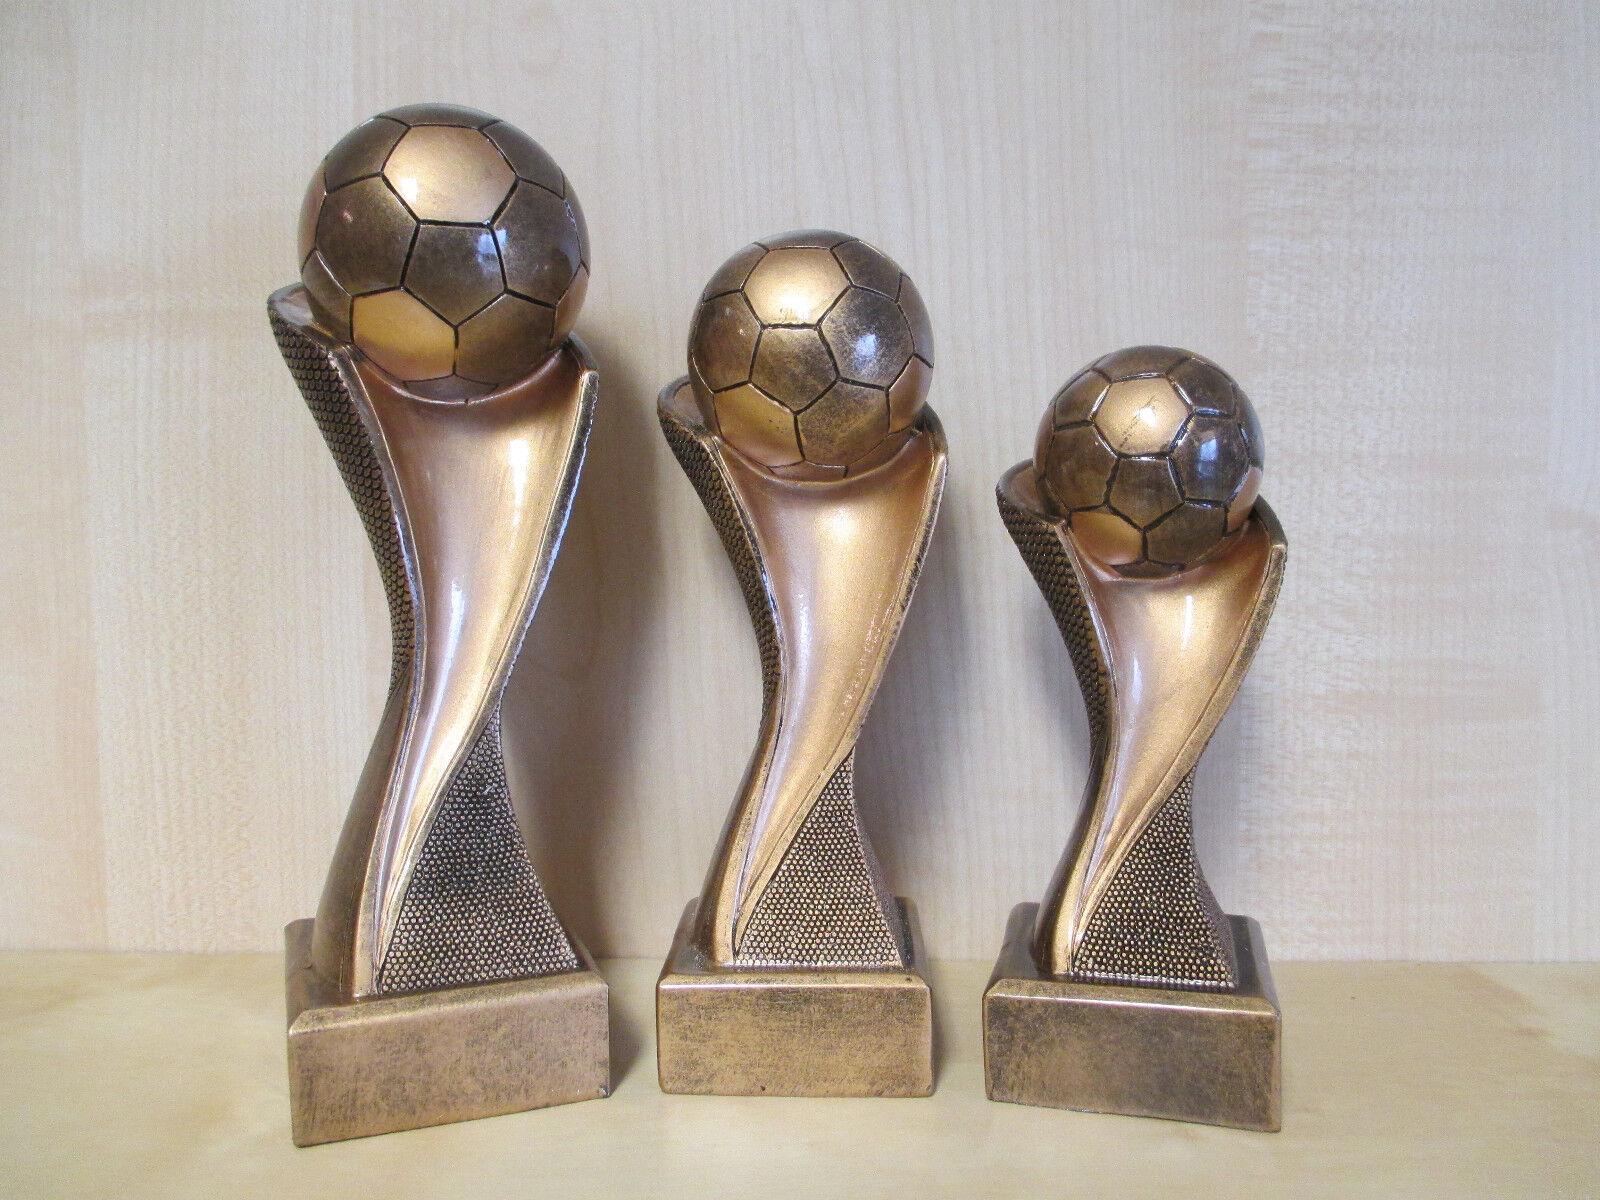 Fußball Pokal 3er Serie 19-27cm Kids Sieger Figur Figur Figur Pokale Turnier m. Gravur (c156 d72542